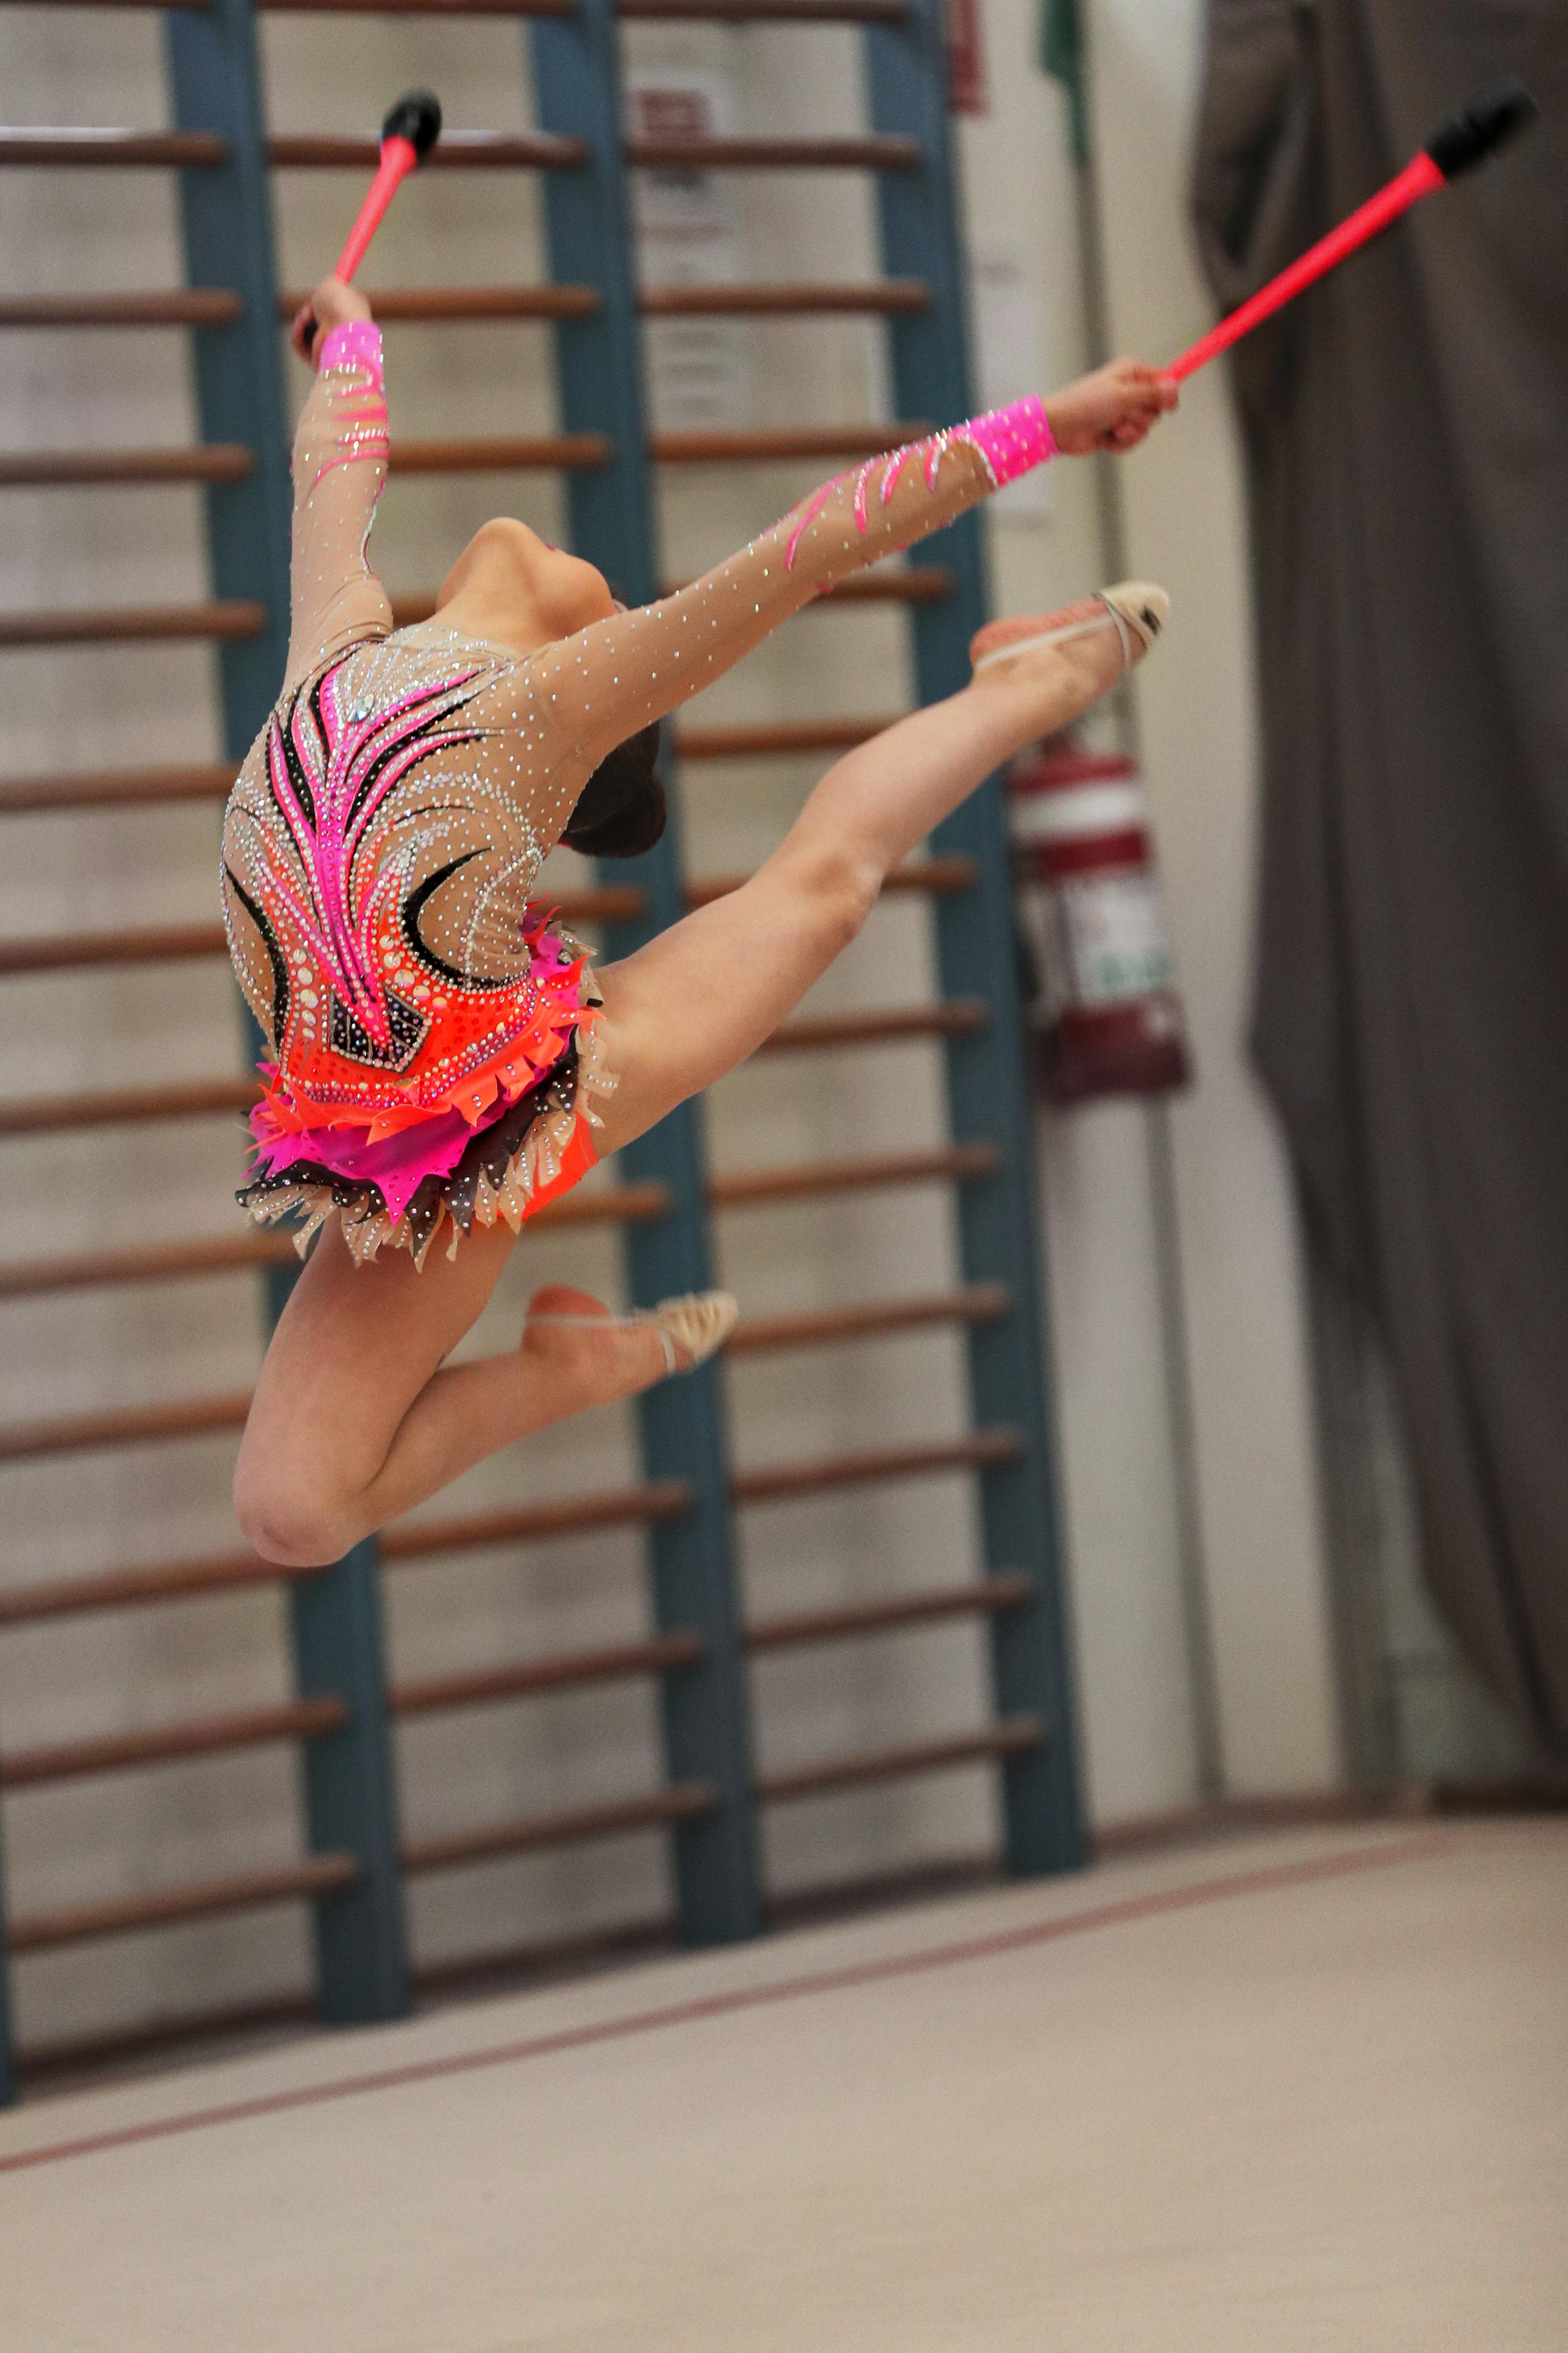 Elodie clubs jump 2017